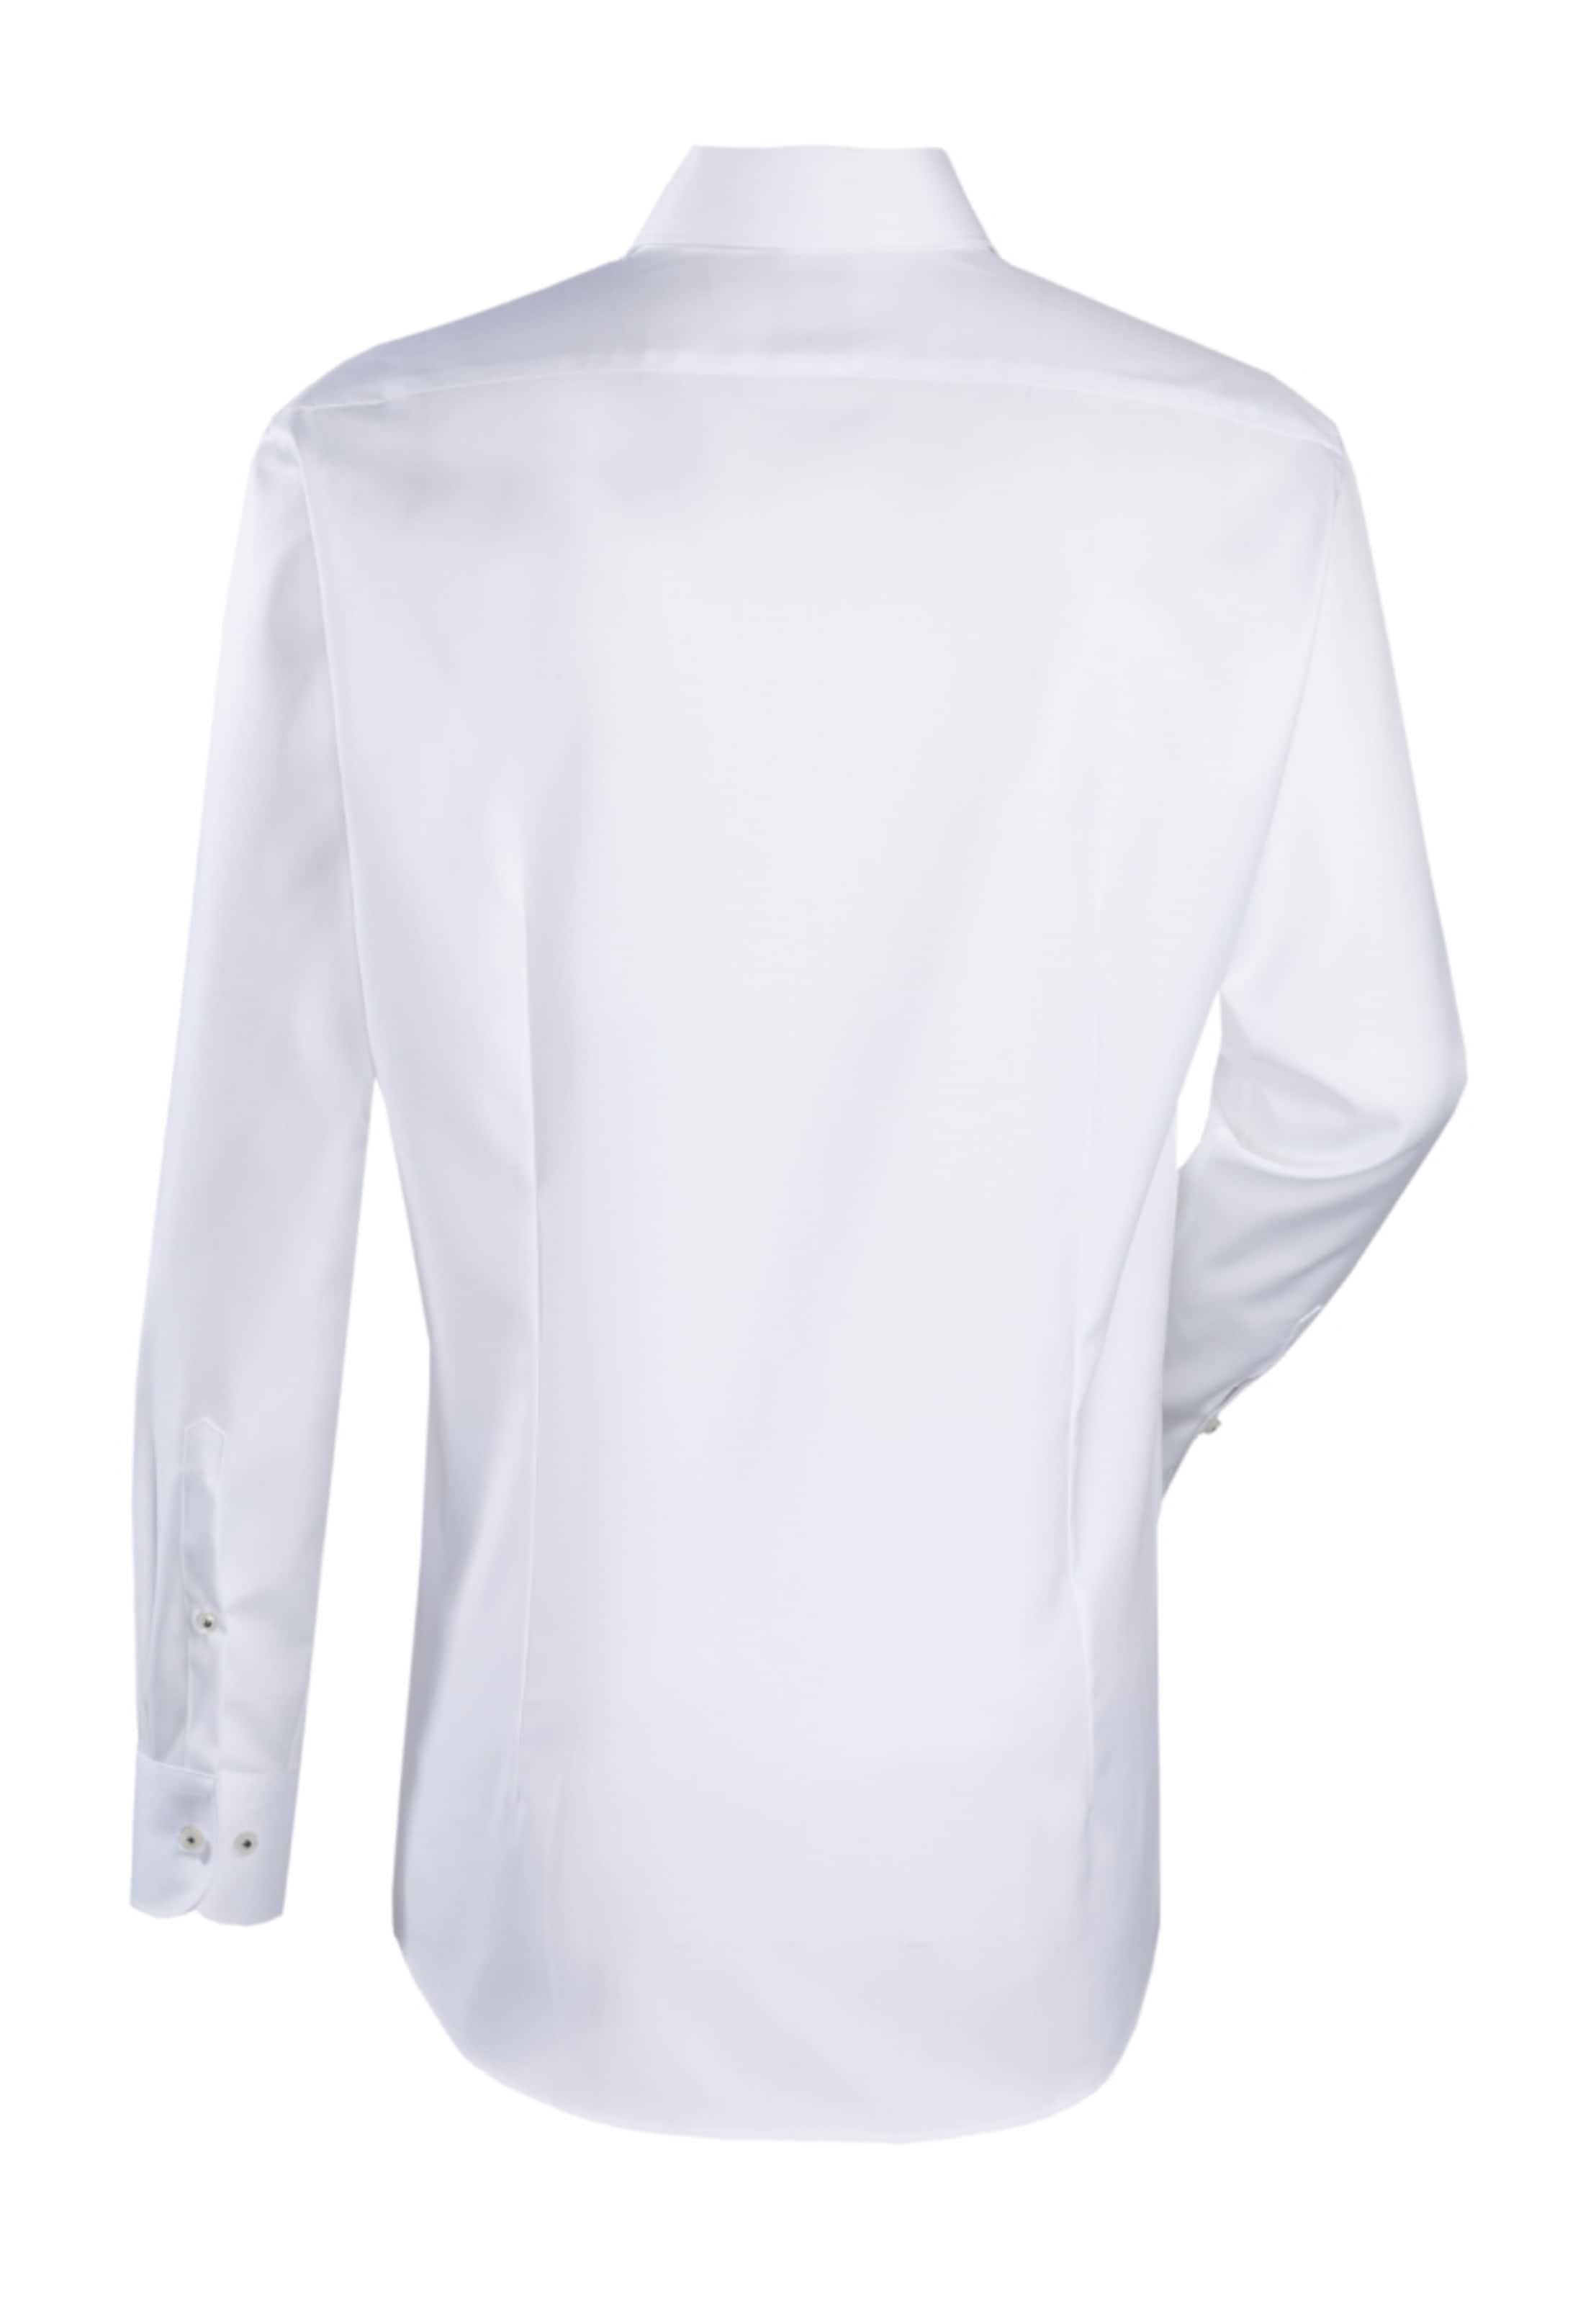 City Fit' Britt hemd 'slim Jacques In Weiß trdshQC